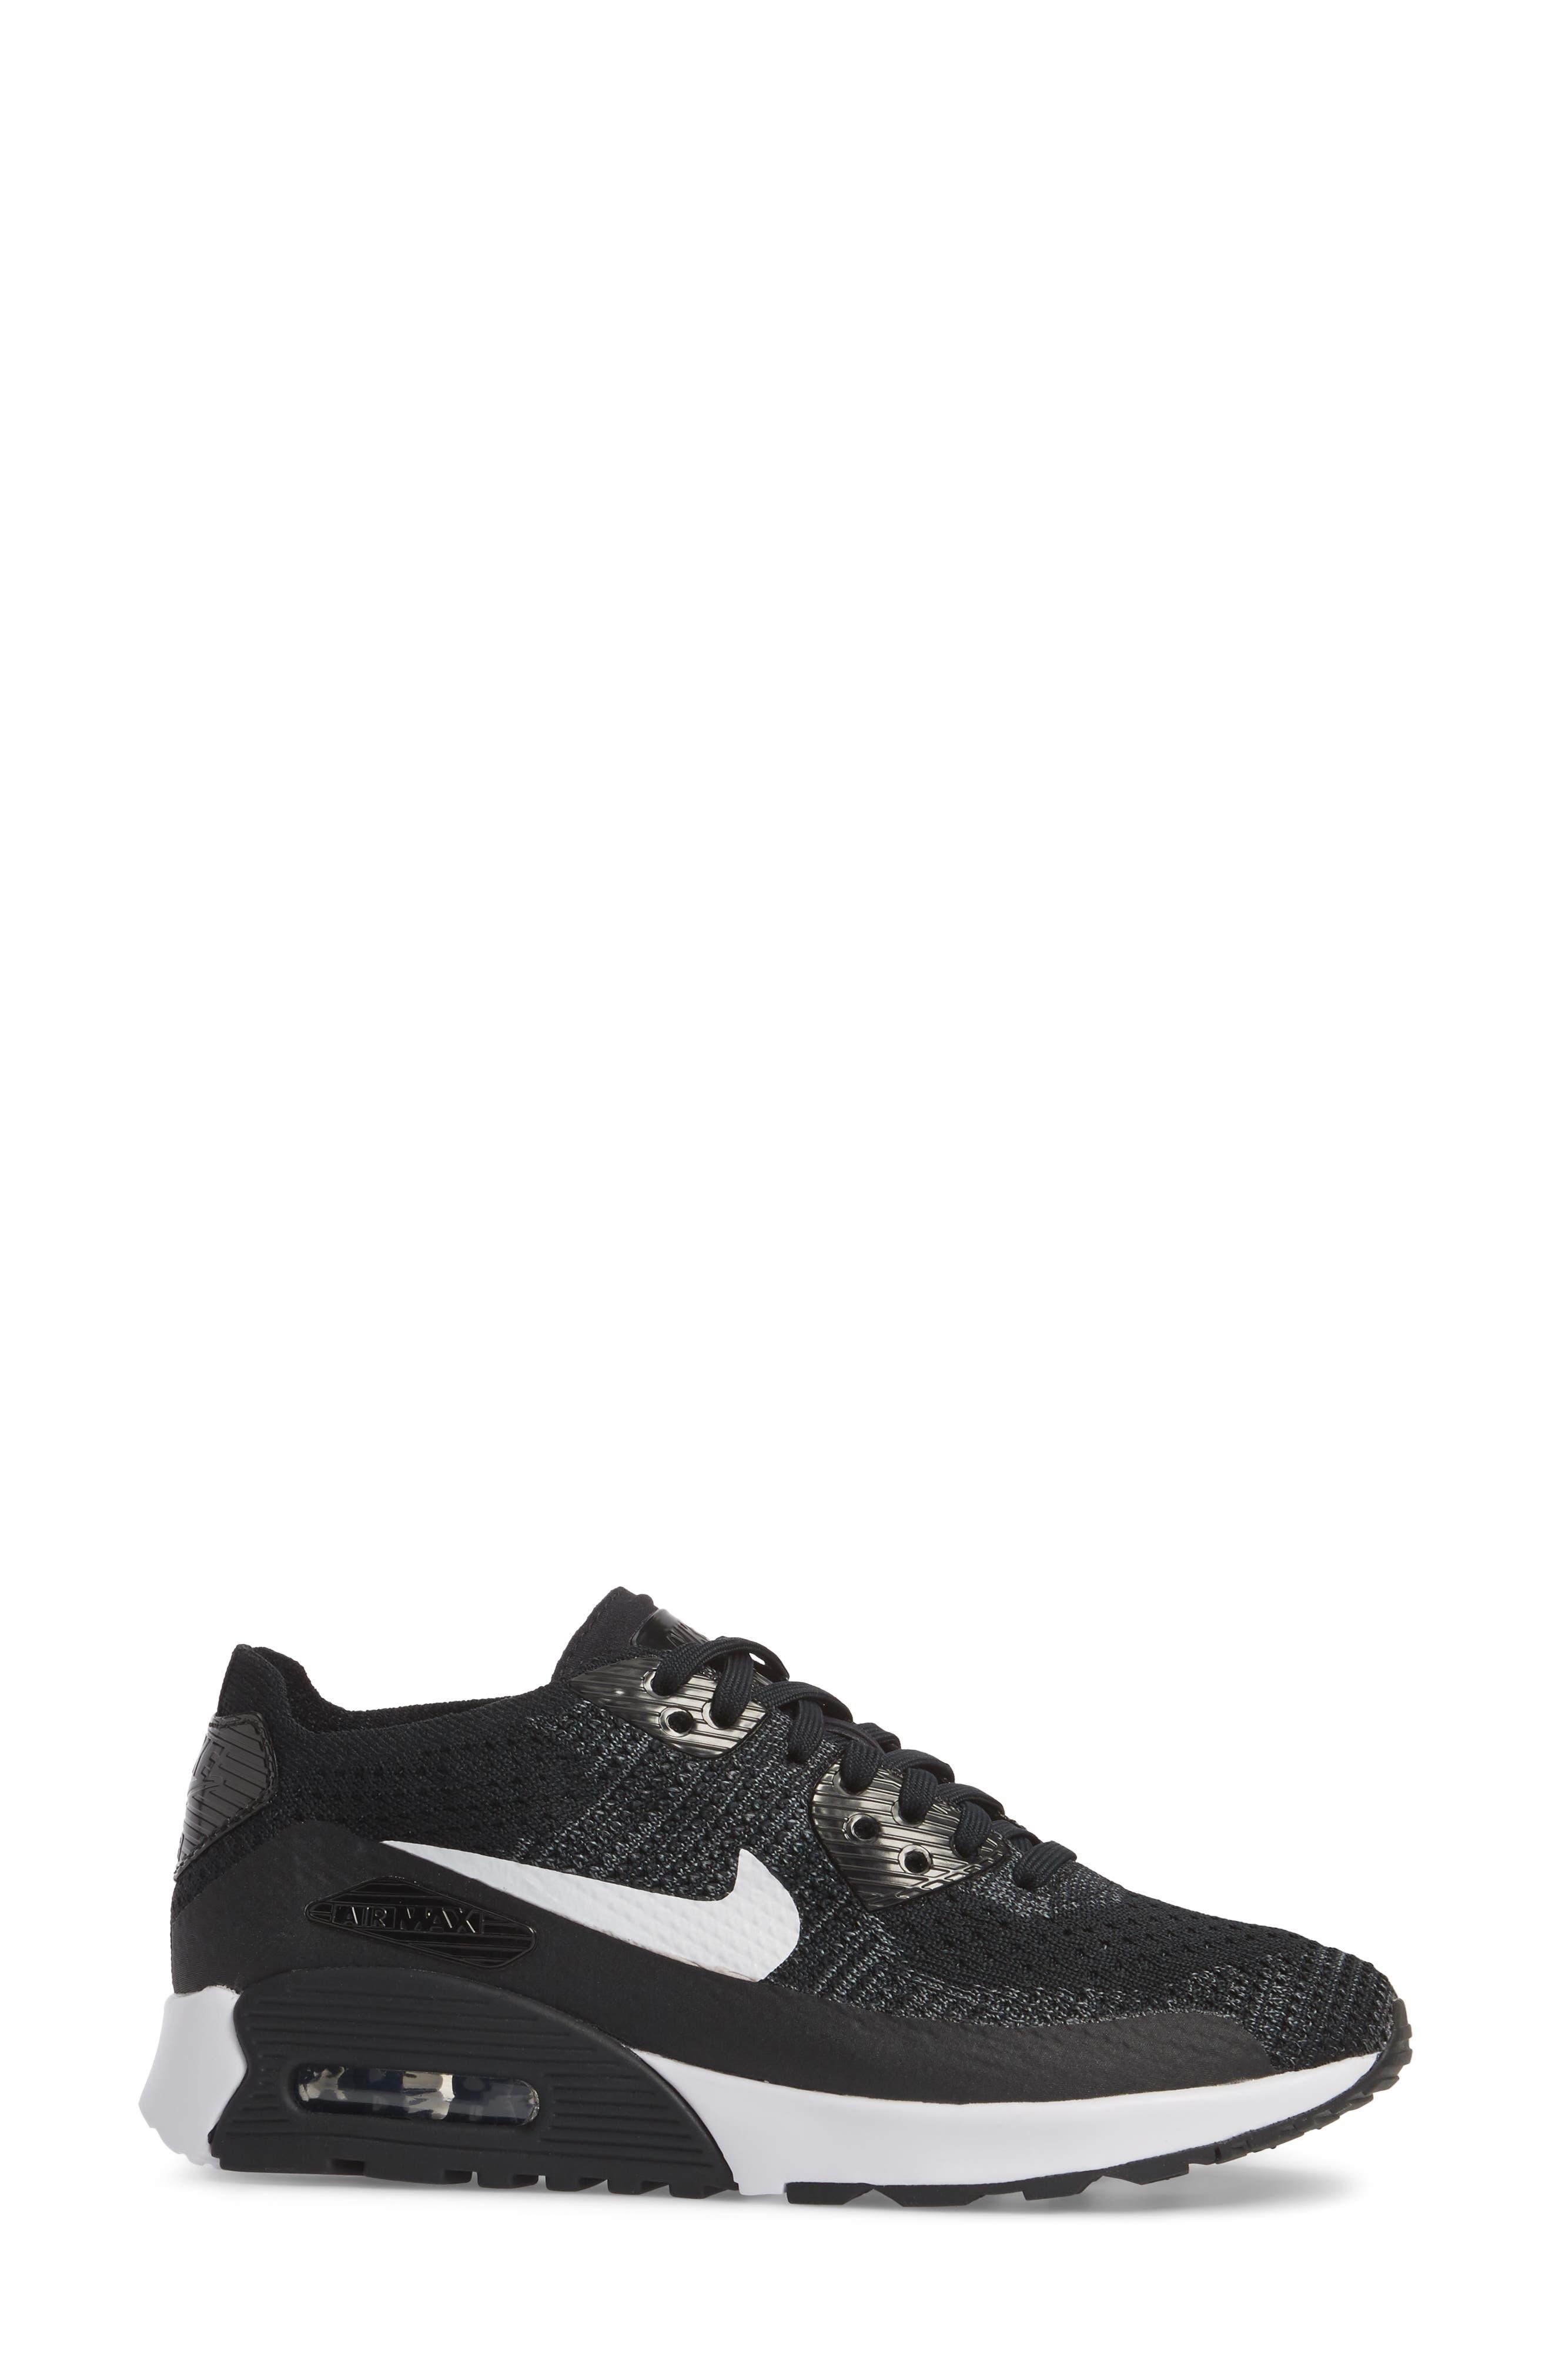 Air Max 90 Flyknit Ultra 2.0 Sneaker,                             Alternate thumbnail 3, color,                             004